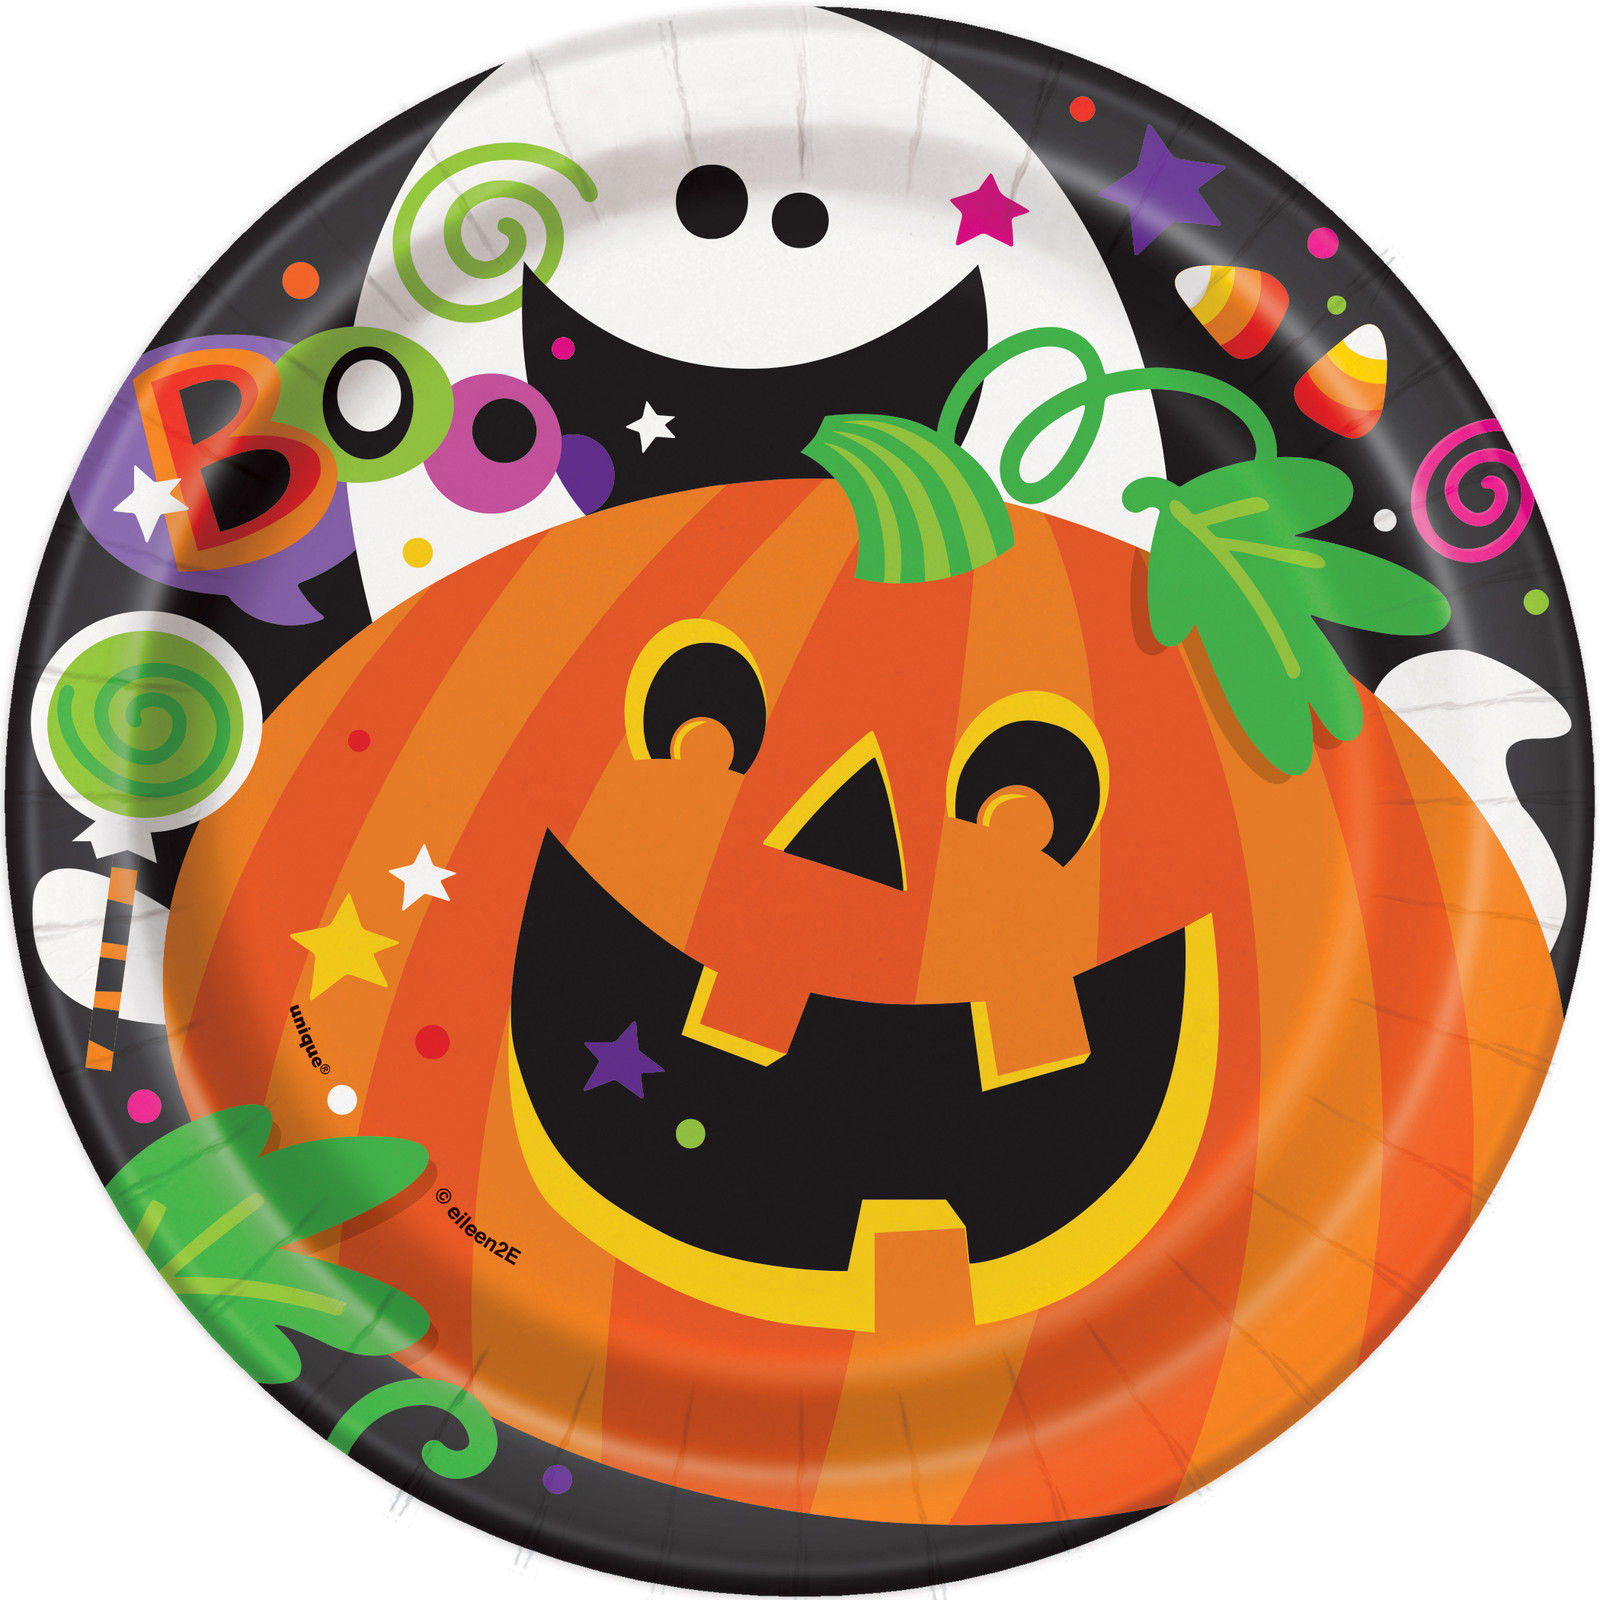 Calabaza Halloween Fantasma Platos De Papel Para Fiesta Mas - Calabaza-de-papel